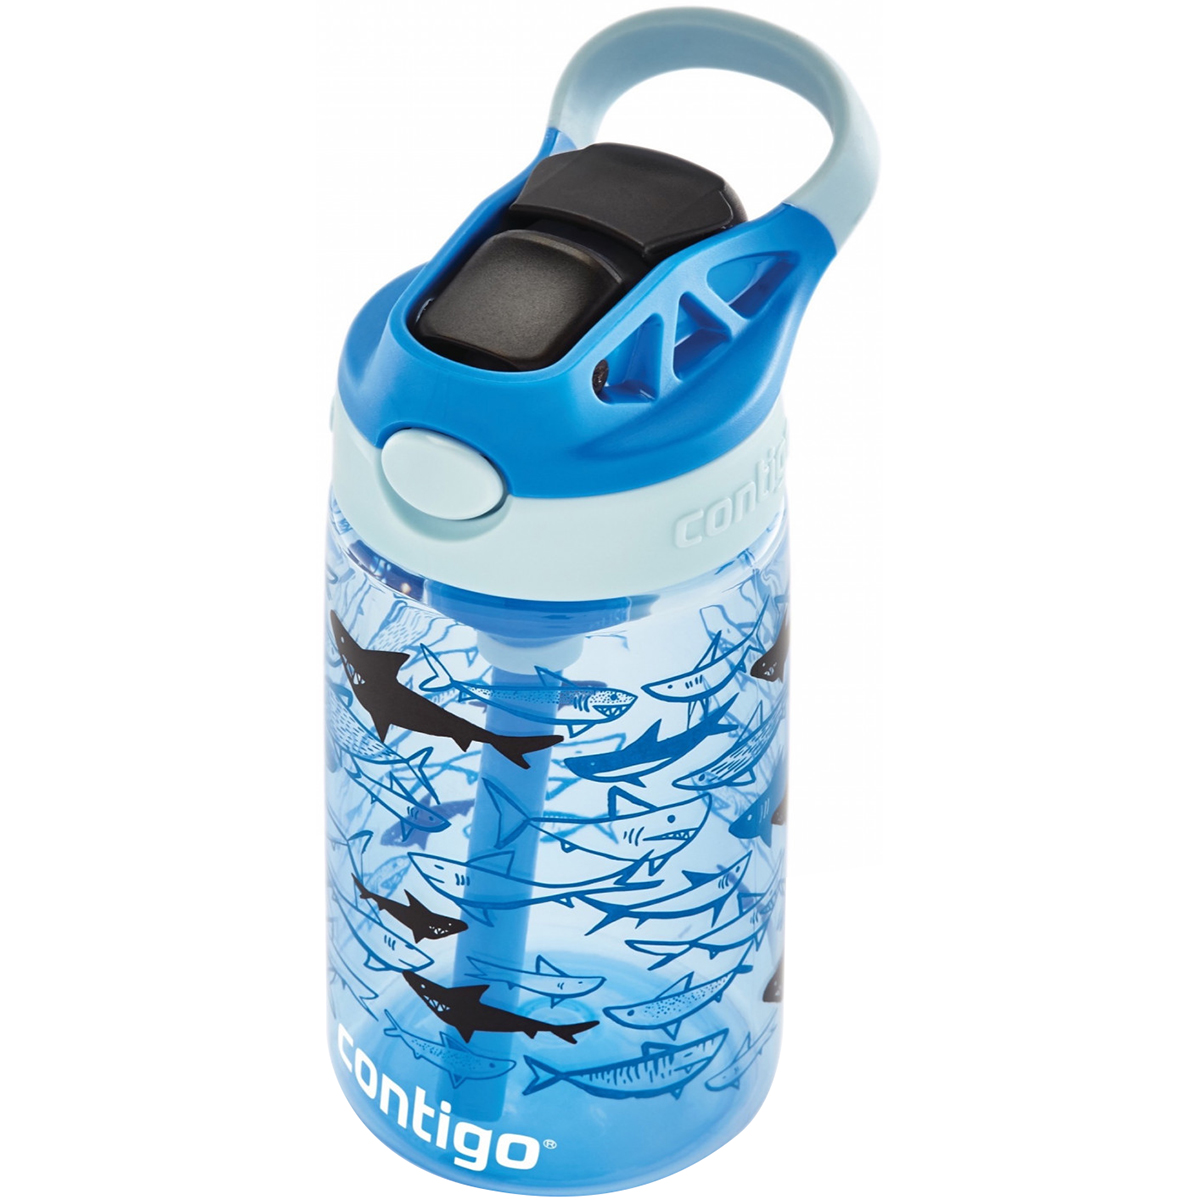 Contigo-Kid-039-s-14-oz-AutoSpout-Straw-Water-Bottle-with-Easy-Clean-Lid thumbnail 33